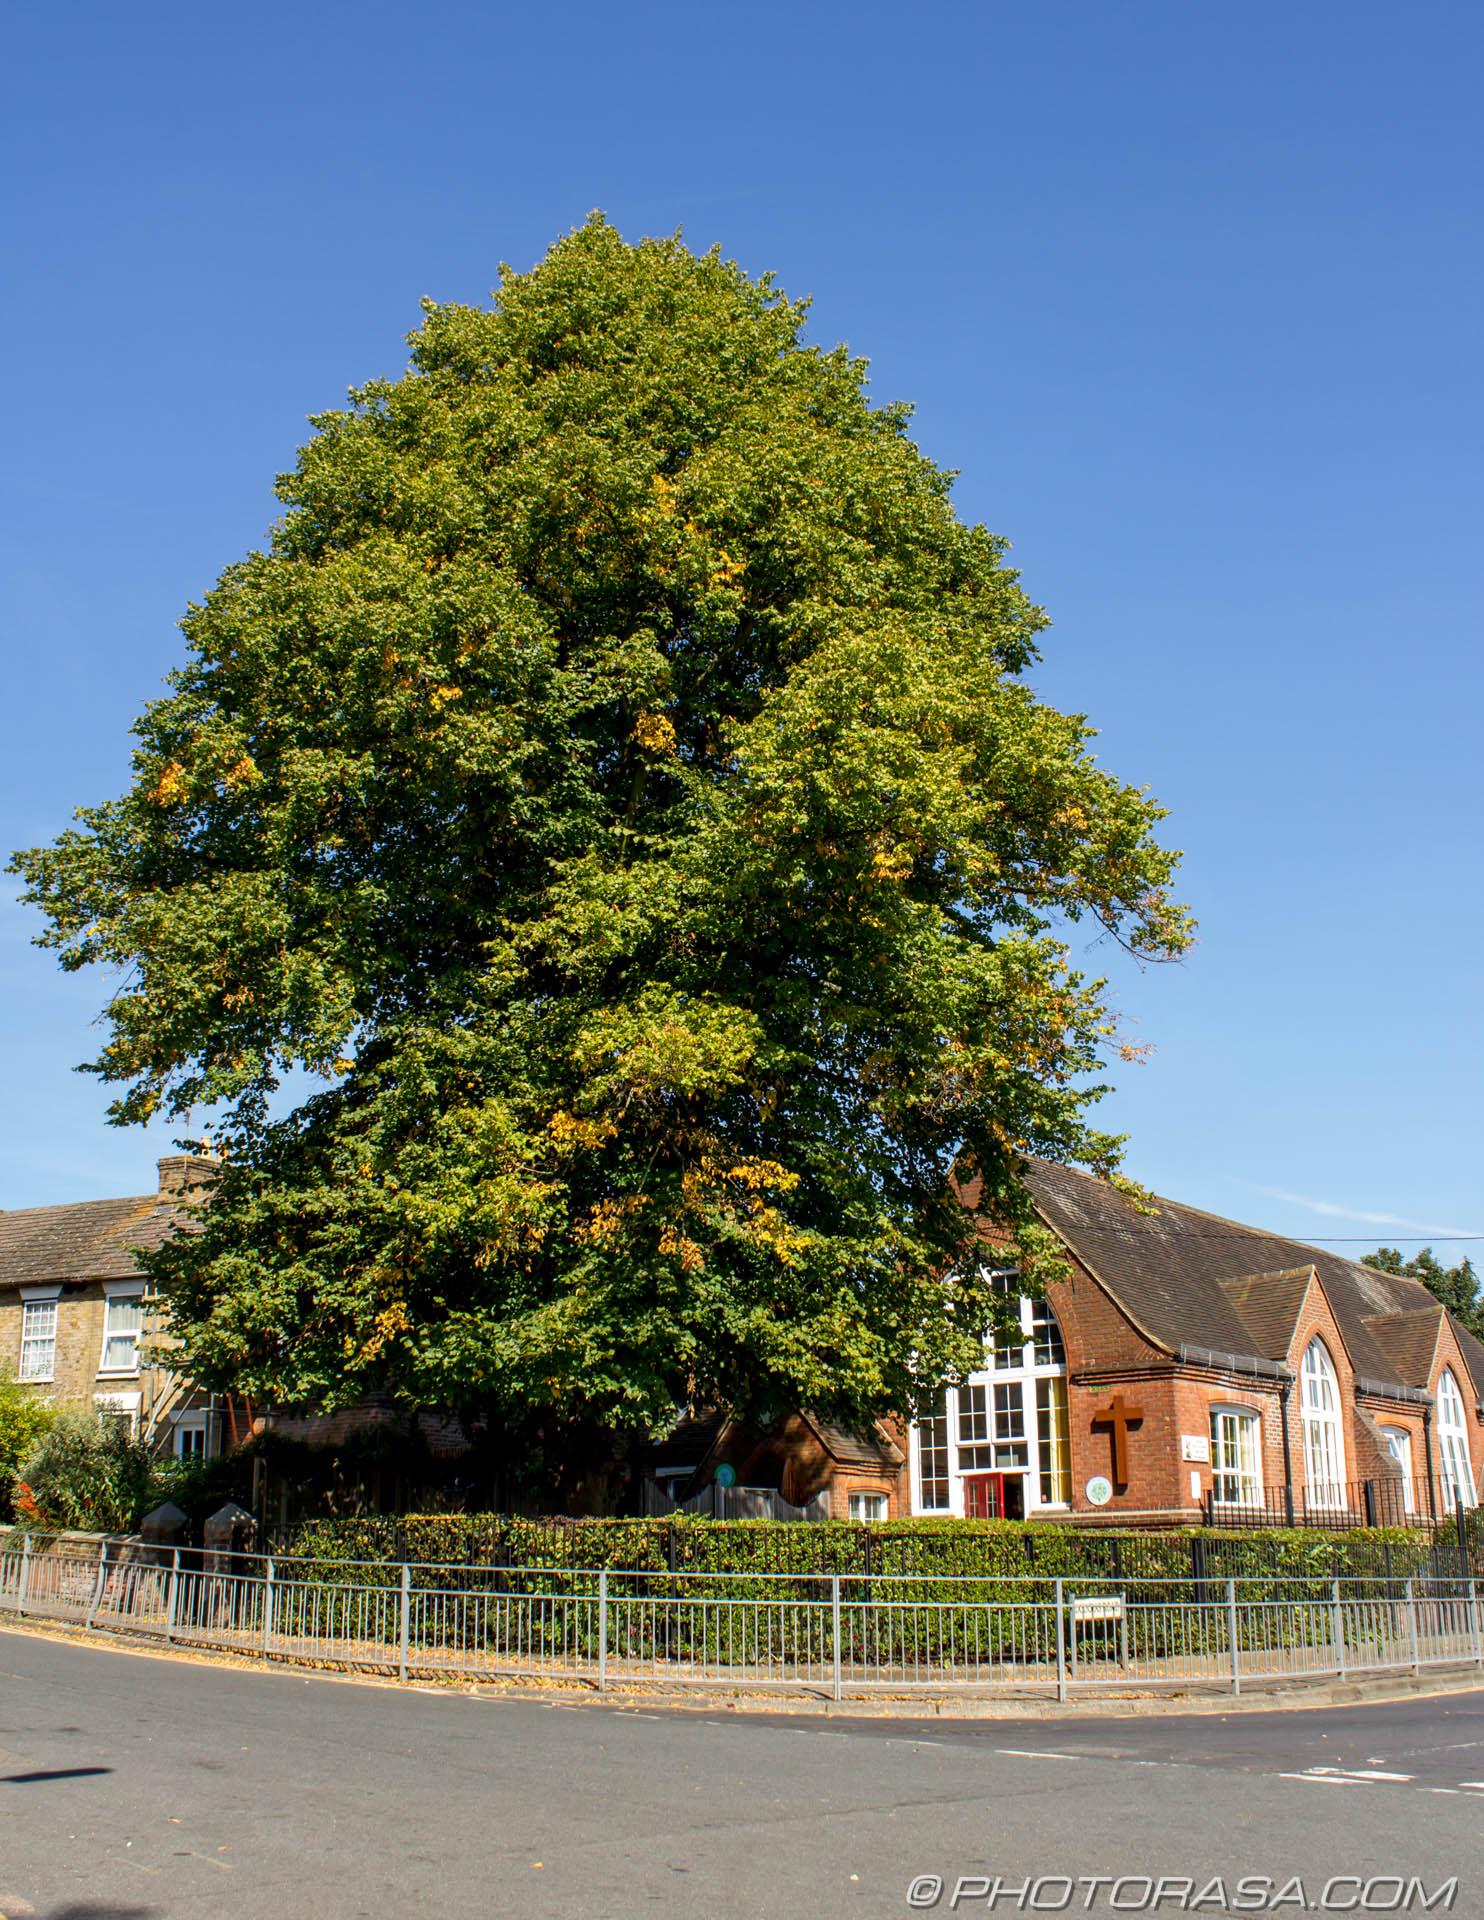 http://photorasa.com/maidstone/large-oak-tree-outside-school/